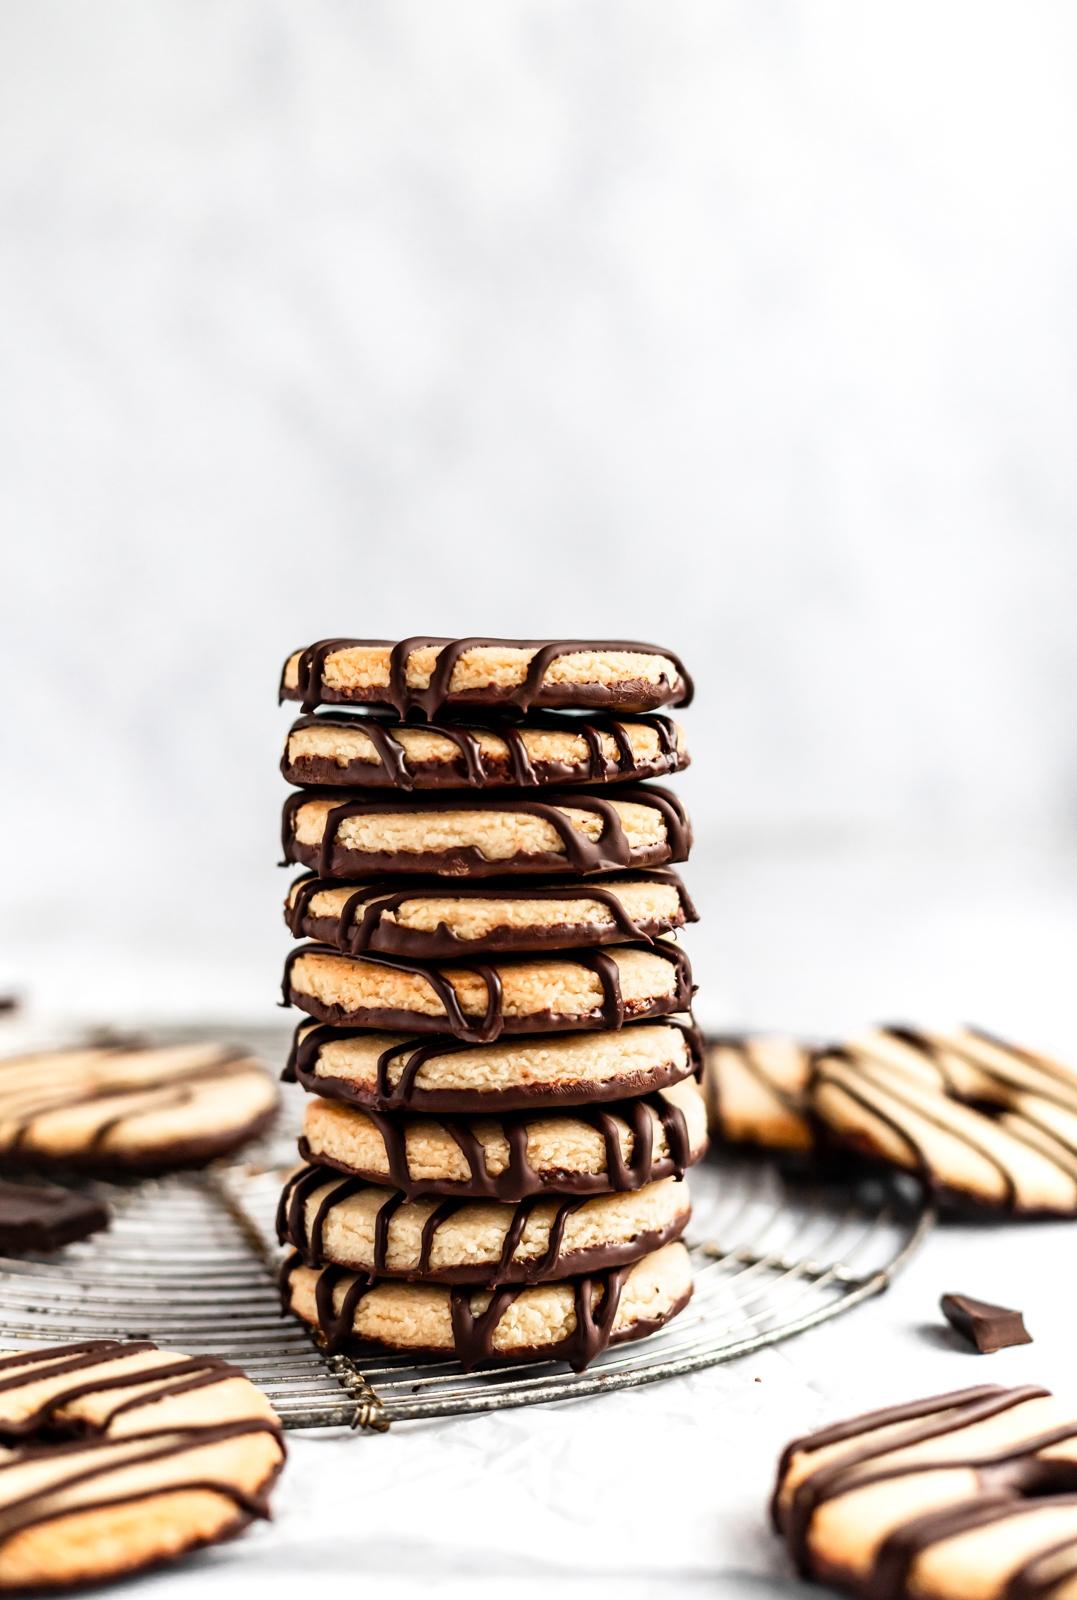 stack of paleo fudge striped shortbread cookies